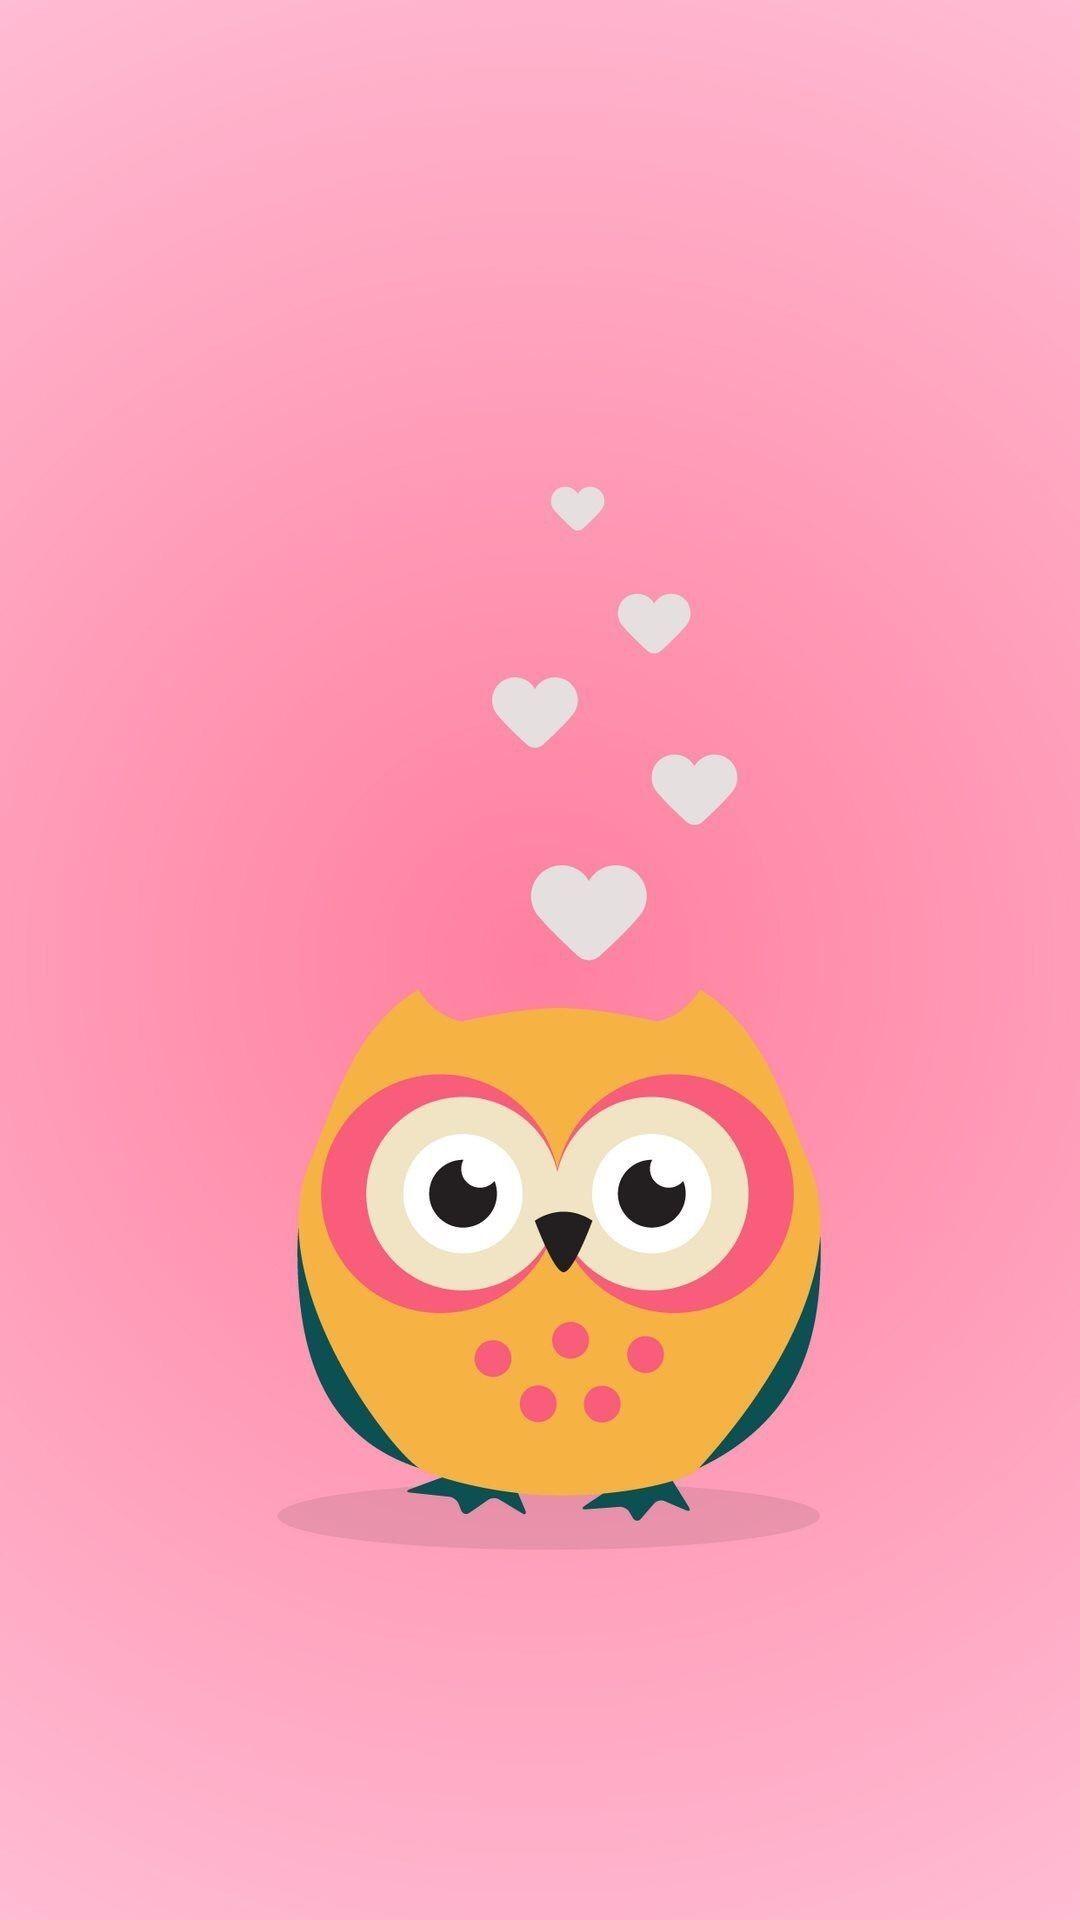 Visit Site To Download Wallpaper Cute 71 Cute Owl Wallpapers On Wallpaperplay Wallpaper Wallpapercute 71 Owl Wallpaper Cute Owls Wallpaper Cute Wallpapers